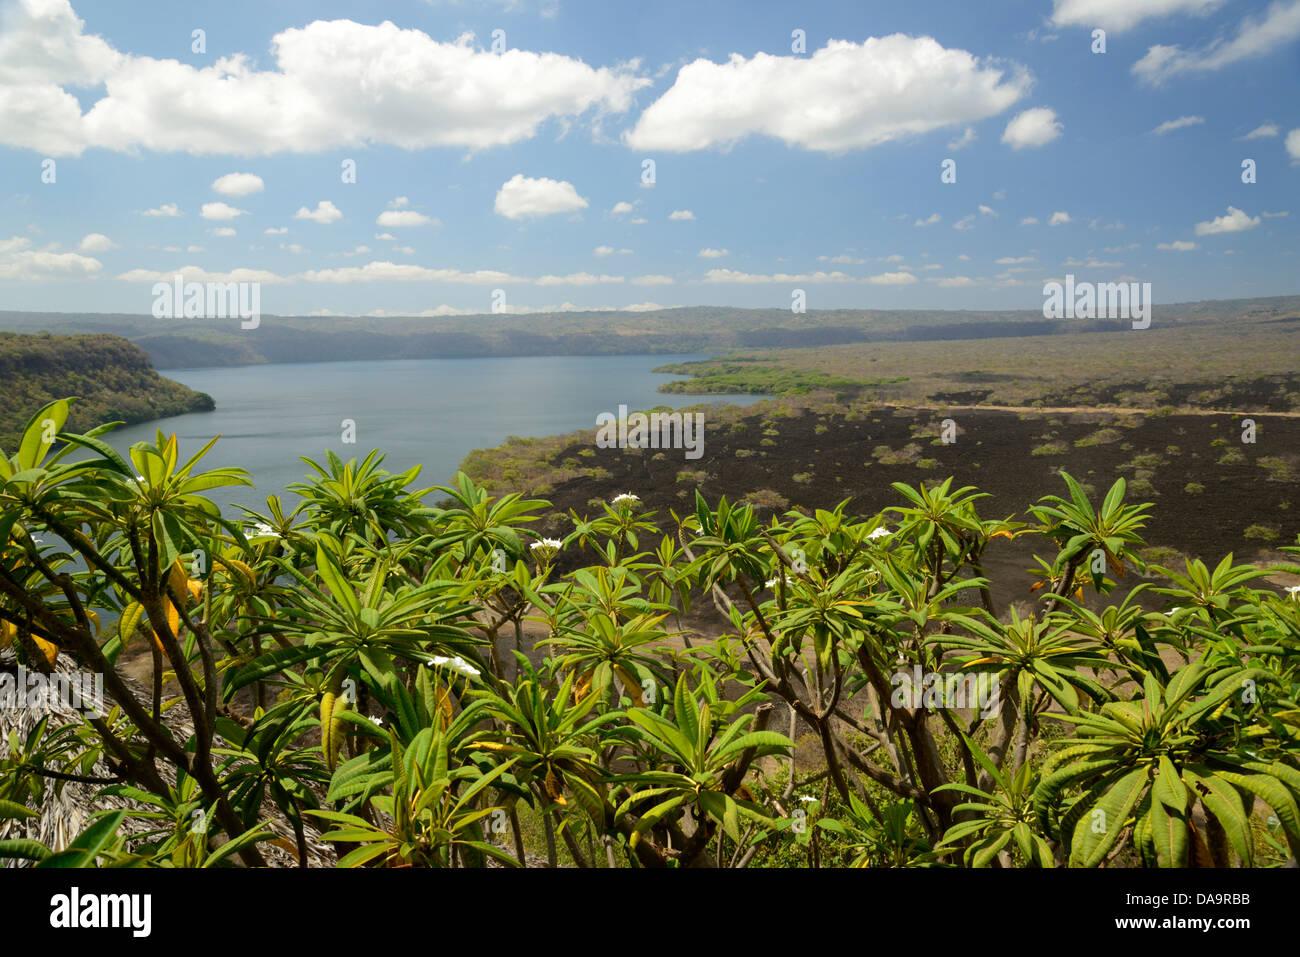 Central America, Nicaragua, Granada, lagune, apoyo, landscape, volcanic, lava, lake, lagune, nature - Stock Image